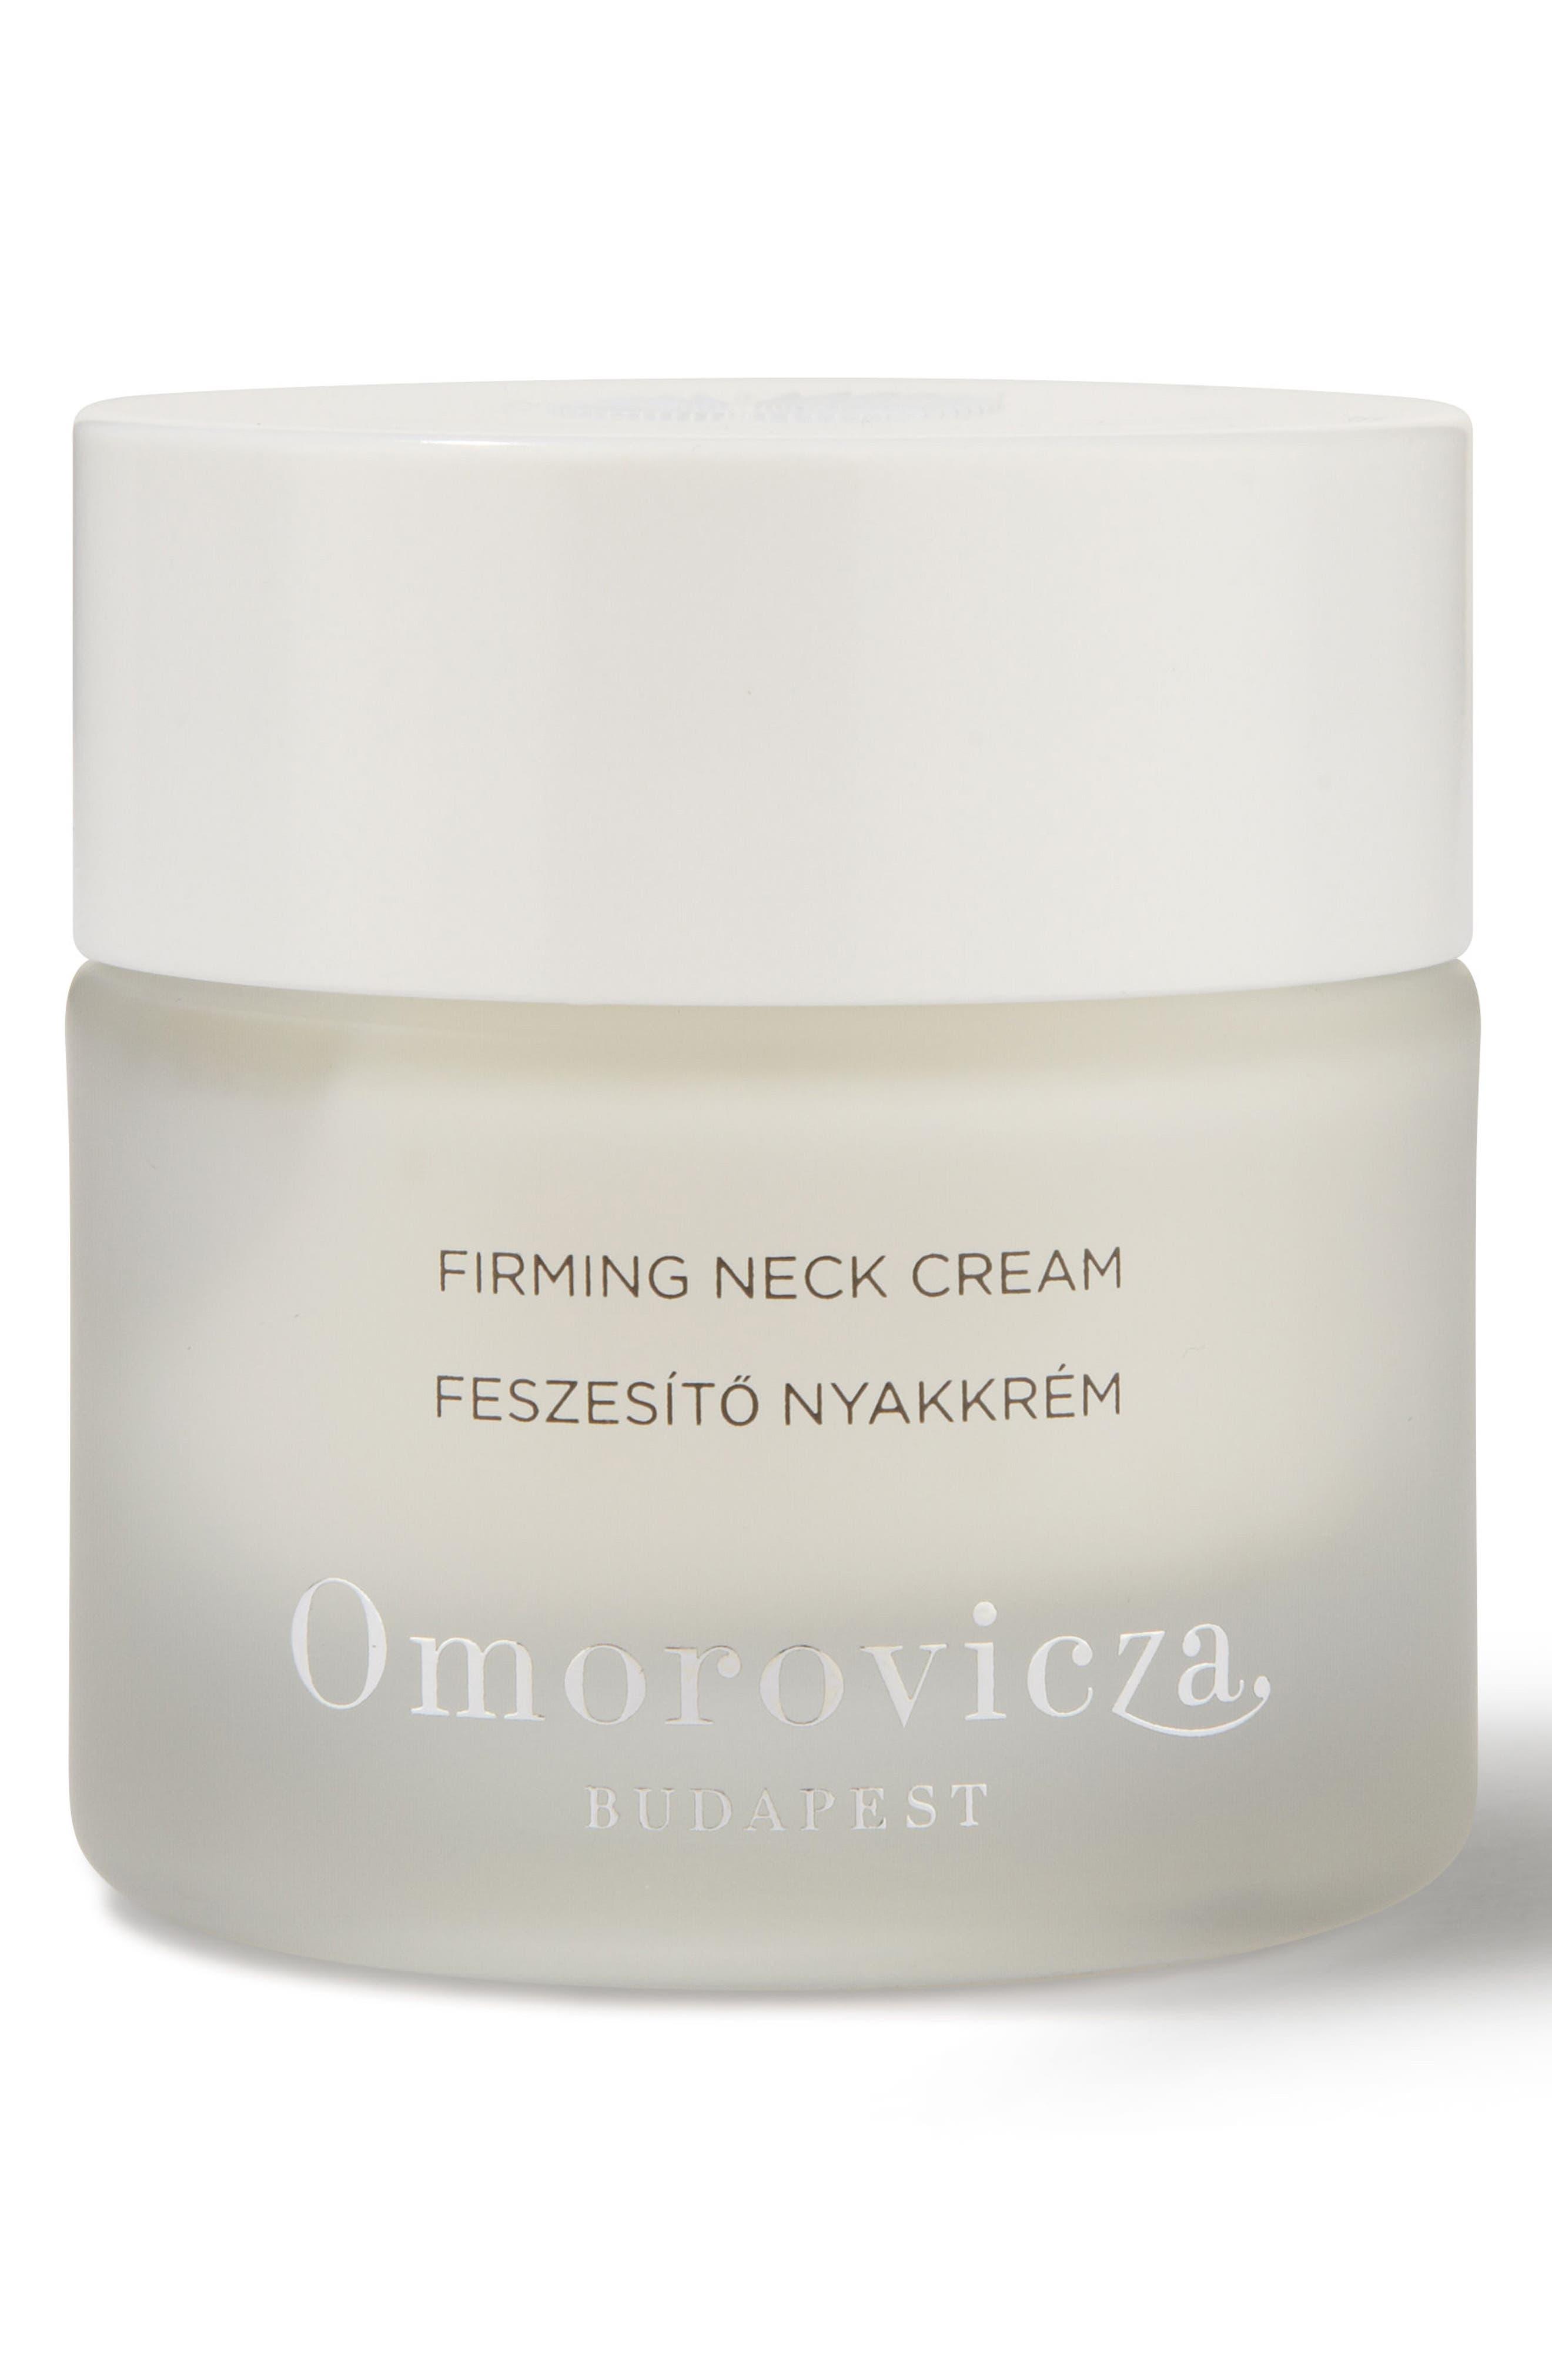 Firming Neck Cream,                         Main,                         color, No Color